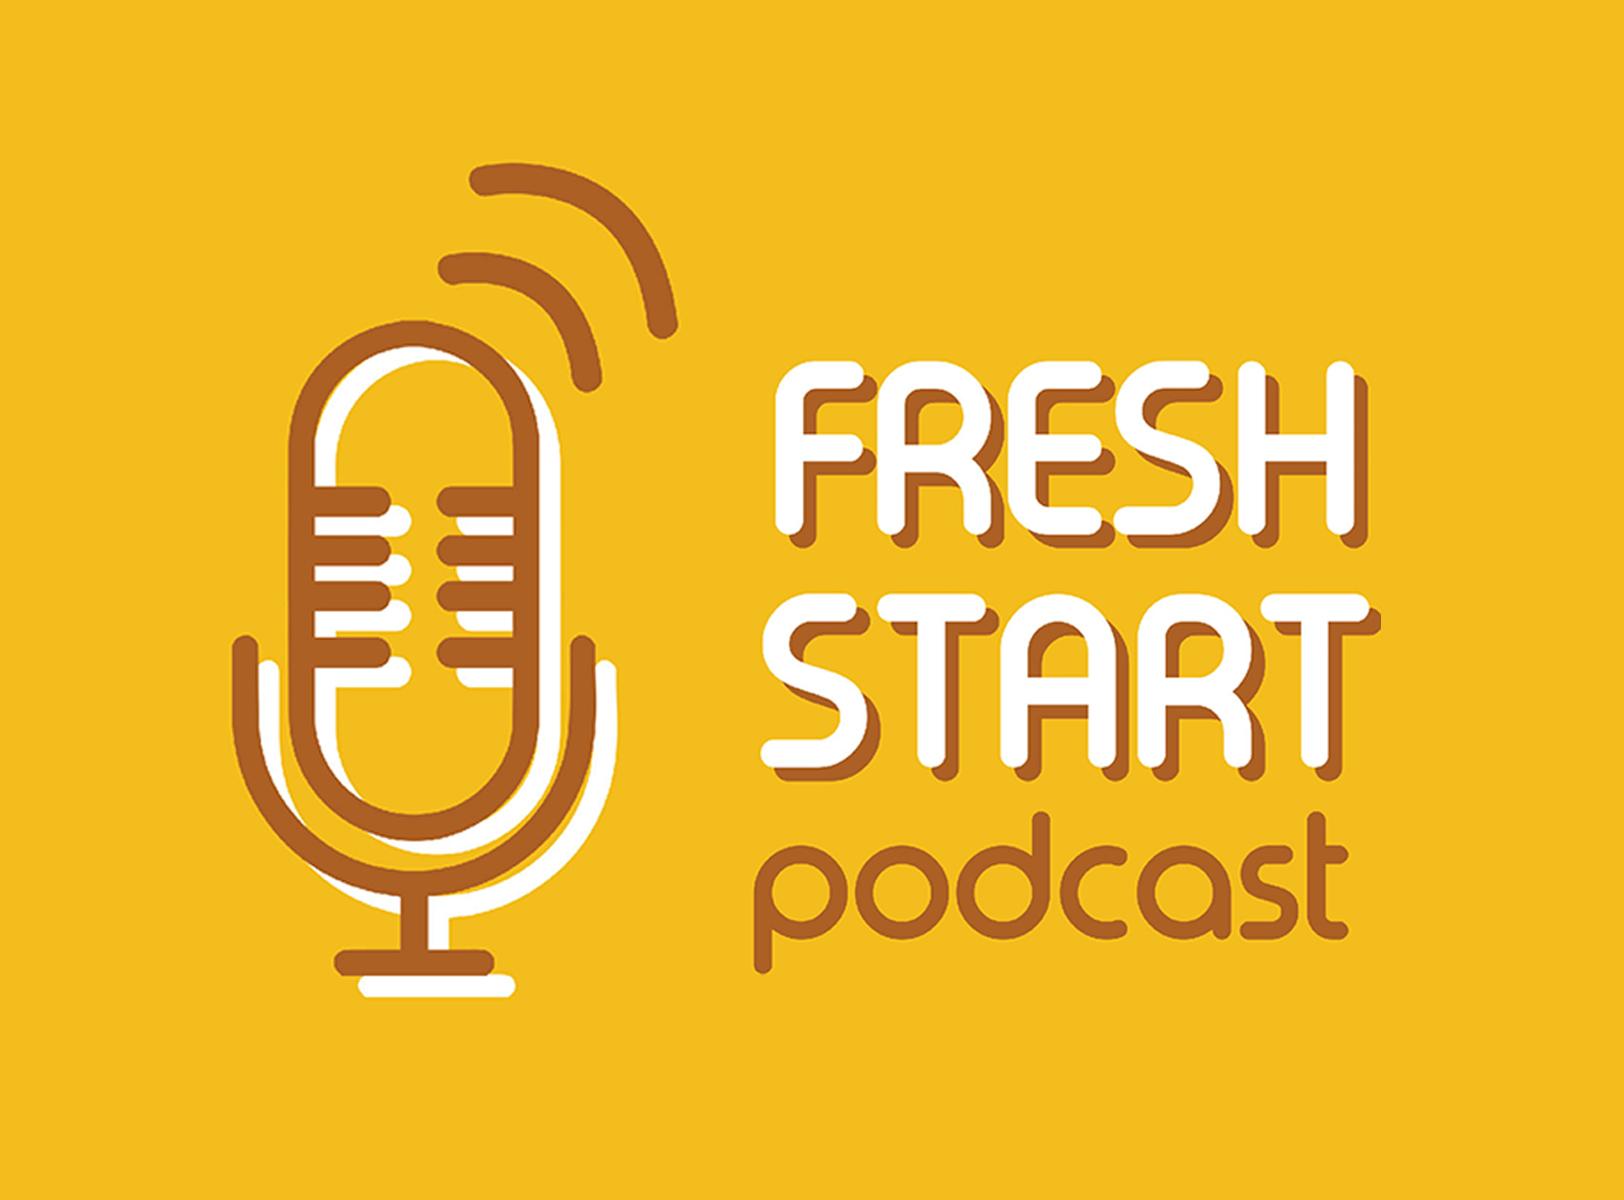 Fresh Start: Podcast News (7/2/2019 Tue.)